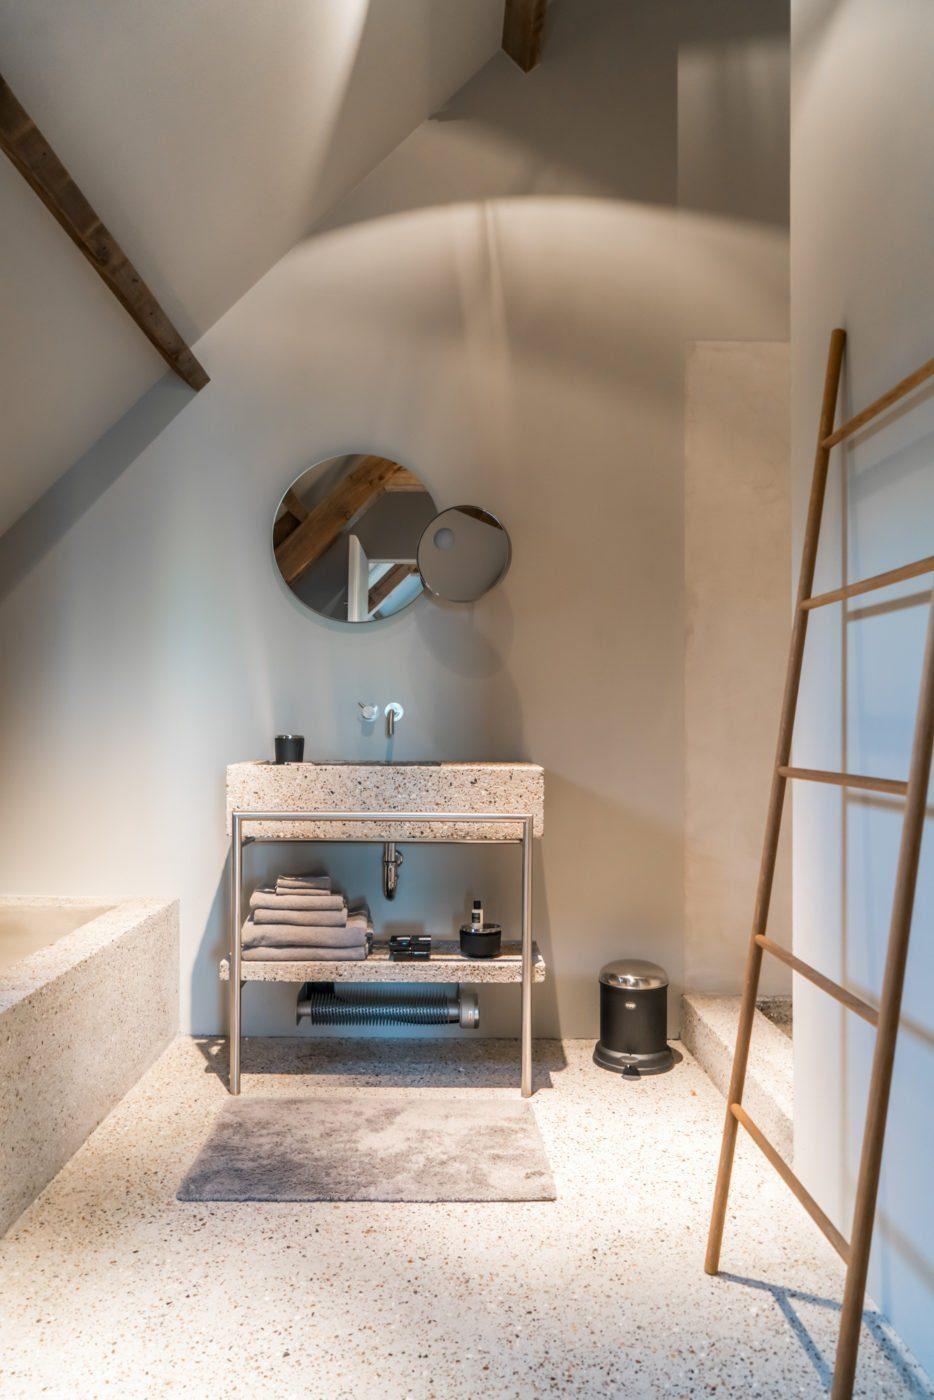 bed and breakfast The Bunkers in Knokke has a very modern bathroom